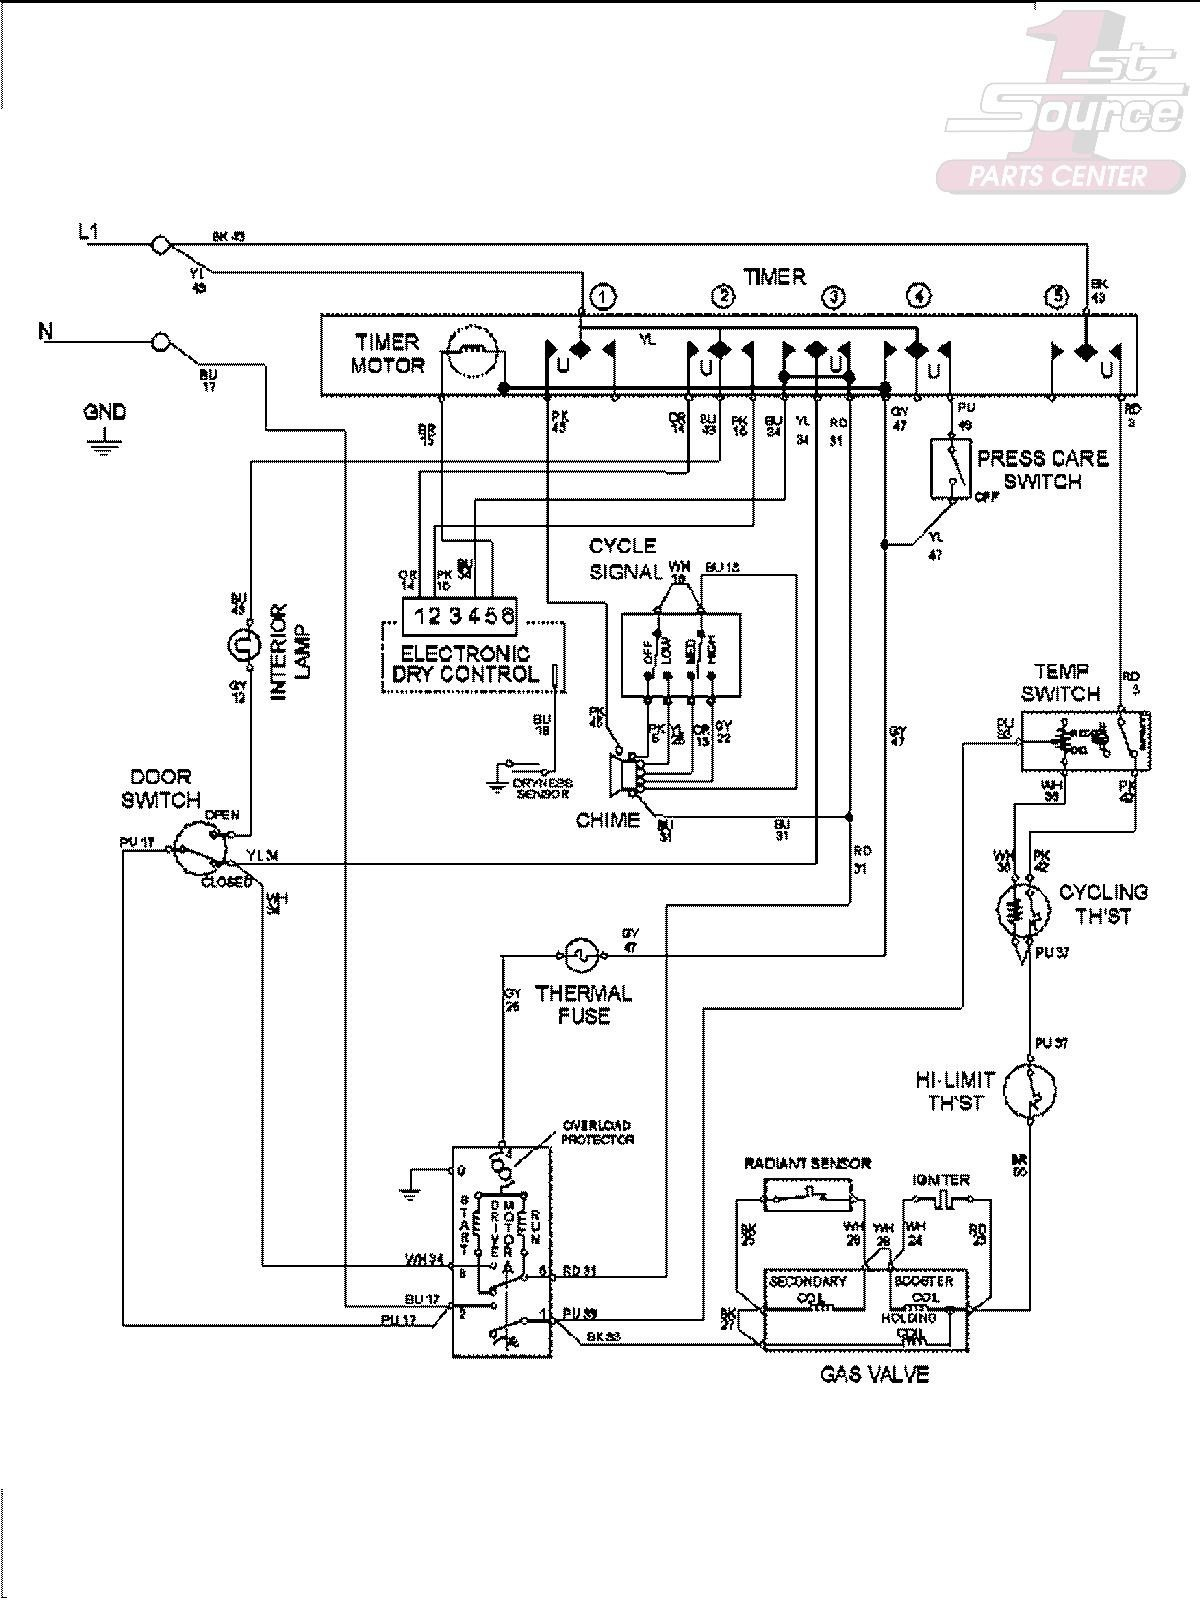 dryer wiring diagram as well as maytag dryer wiring diagram wiring